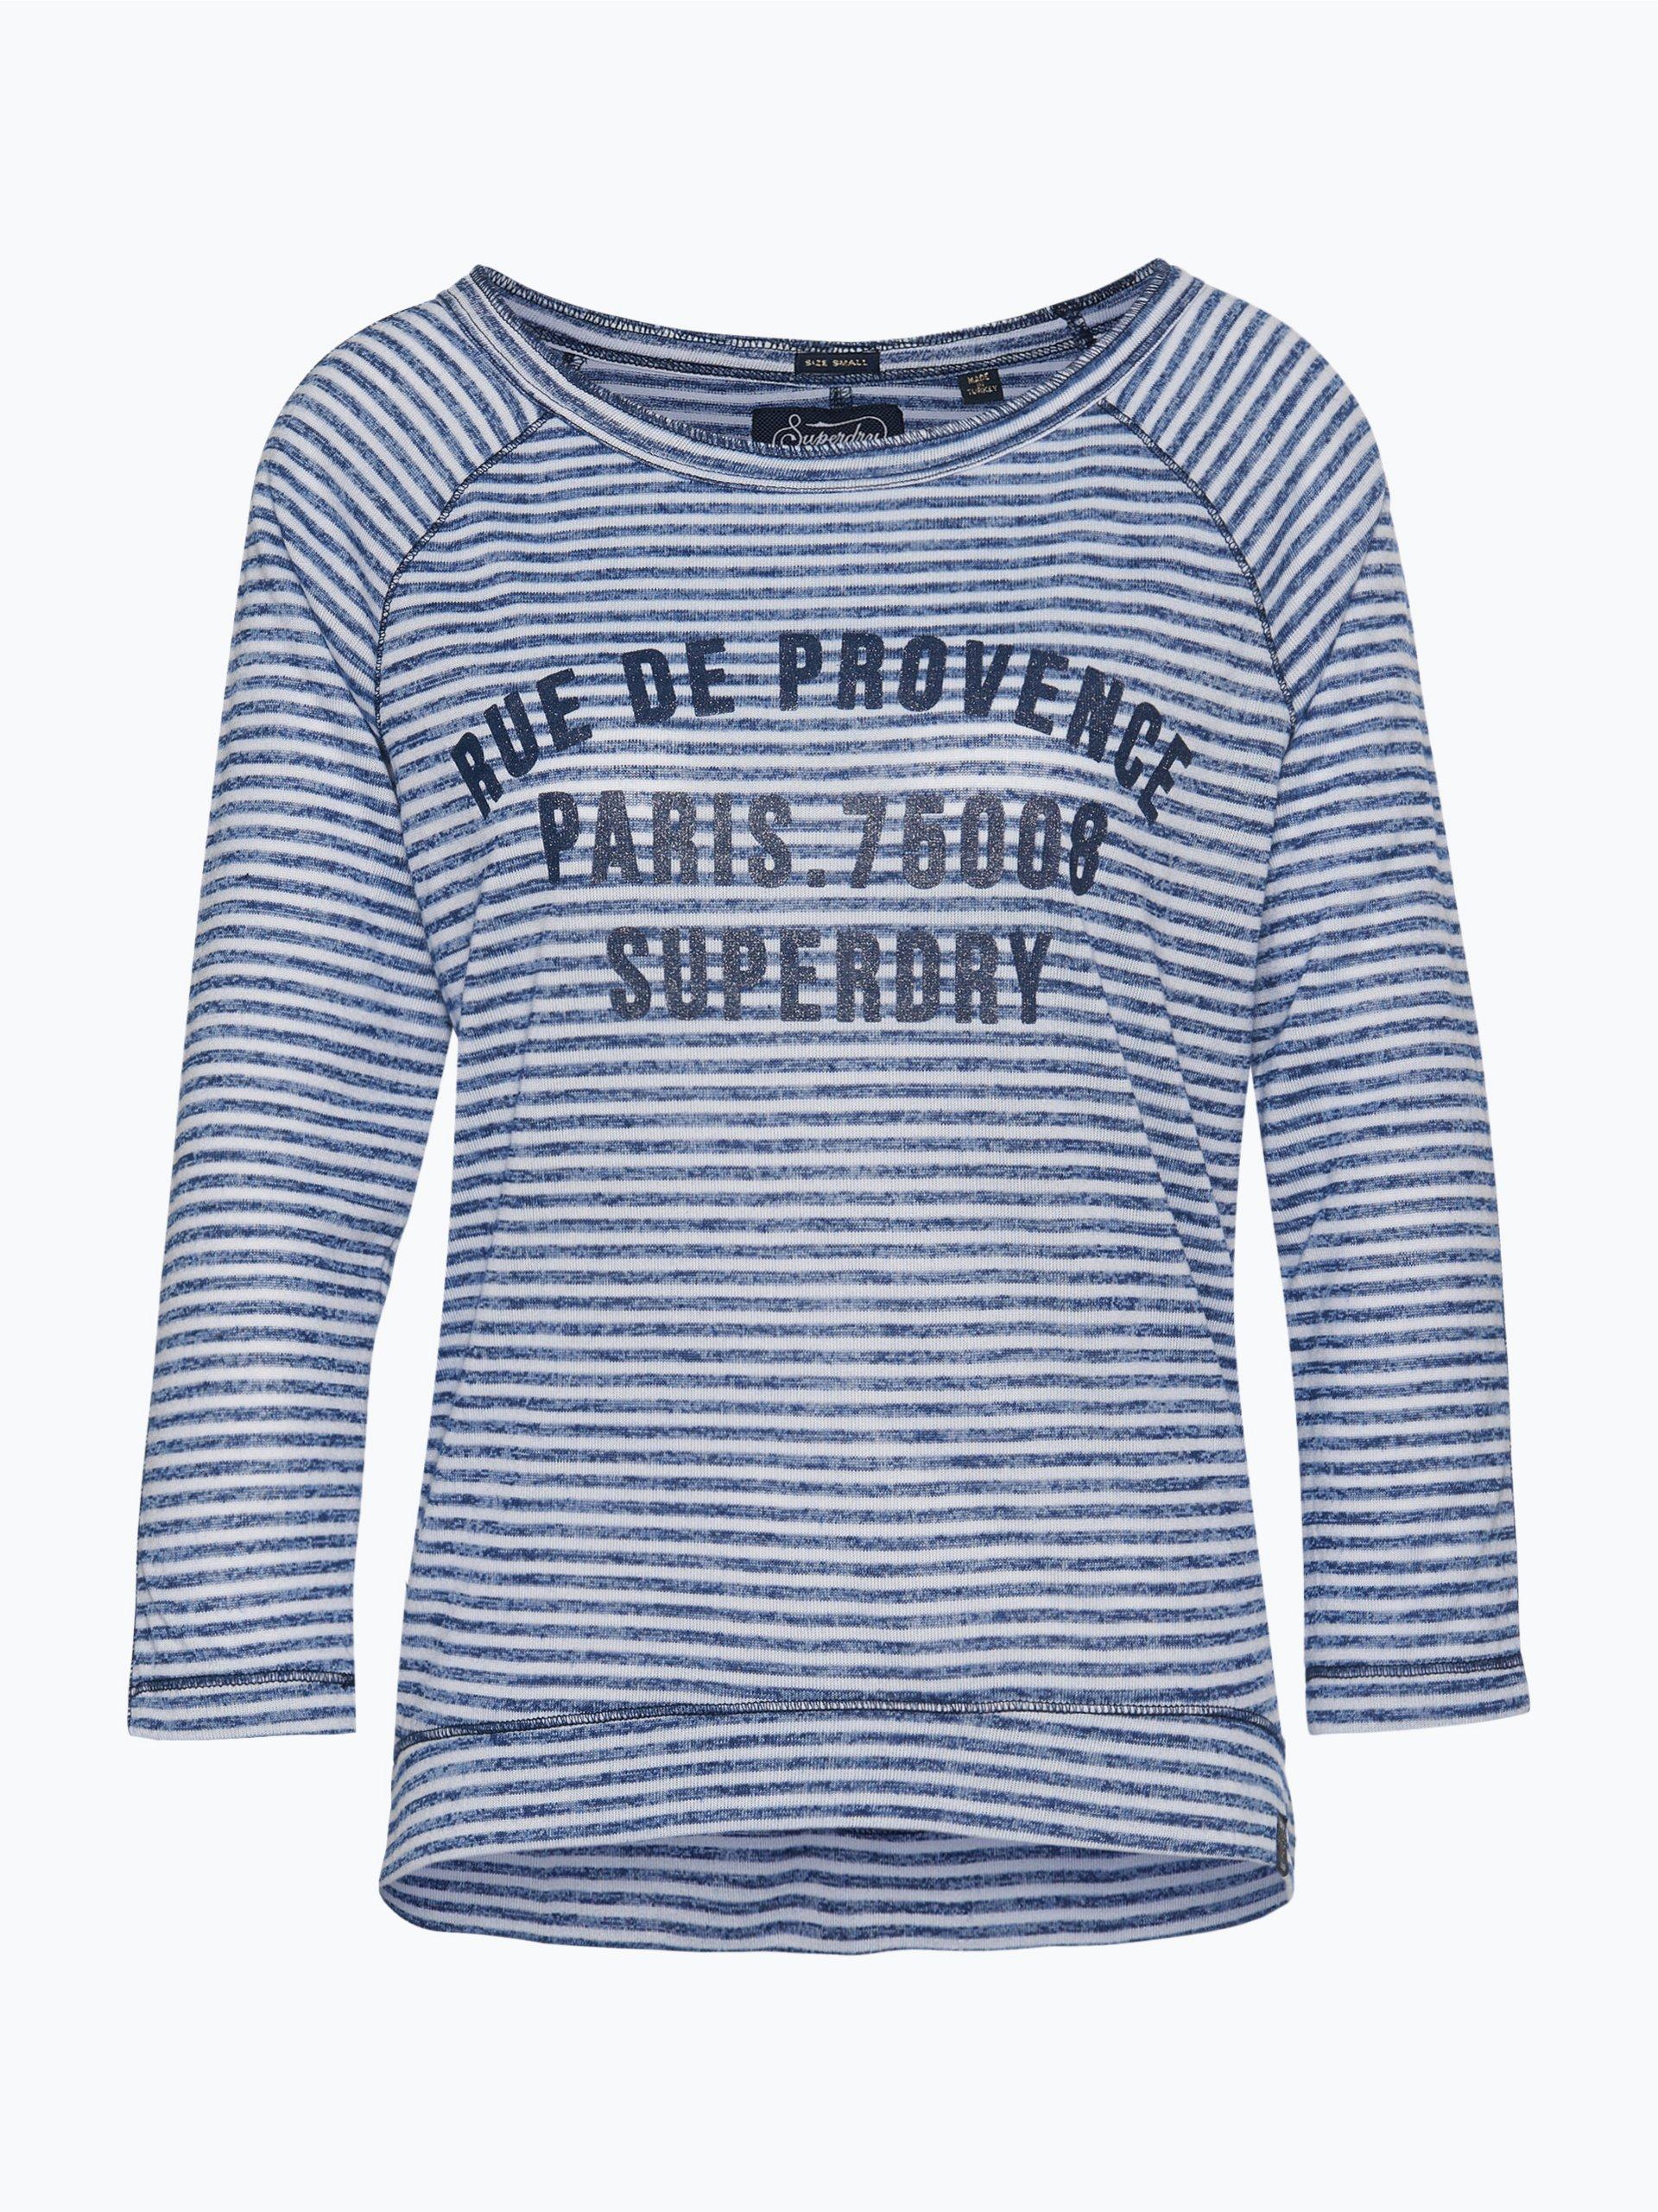 superdry damen shirt marine gestreift online kaufen peek. Black Bedroom Furniture Sets. Home Design Ideas